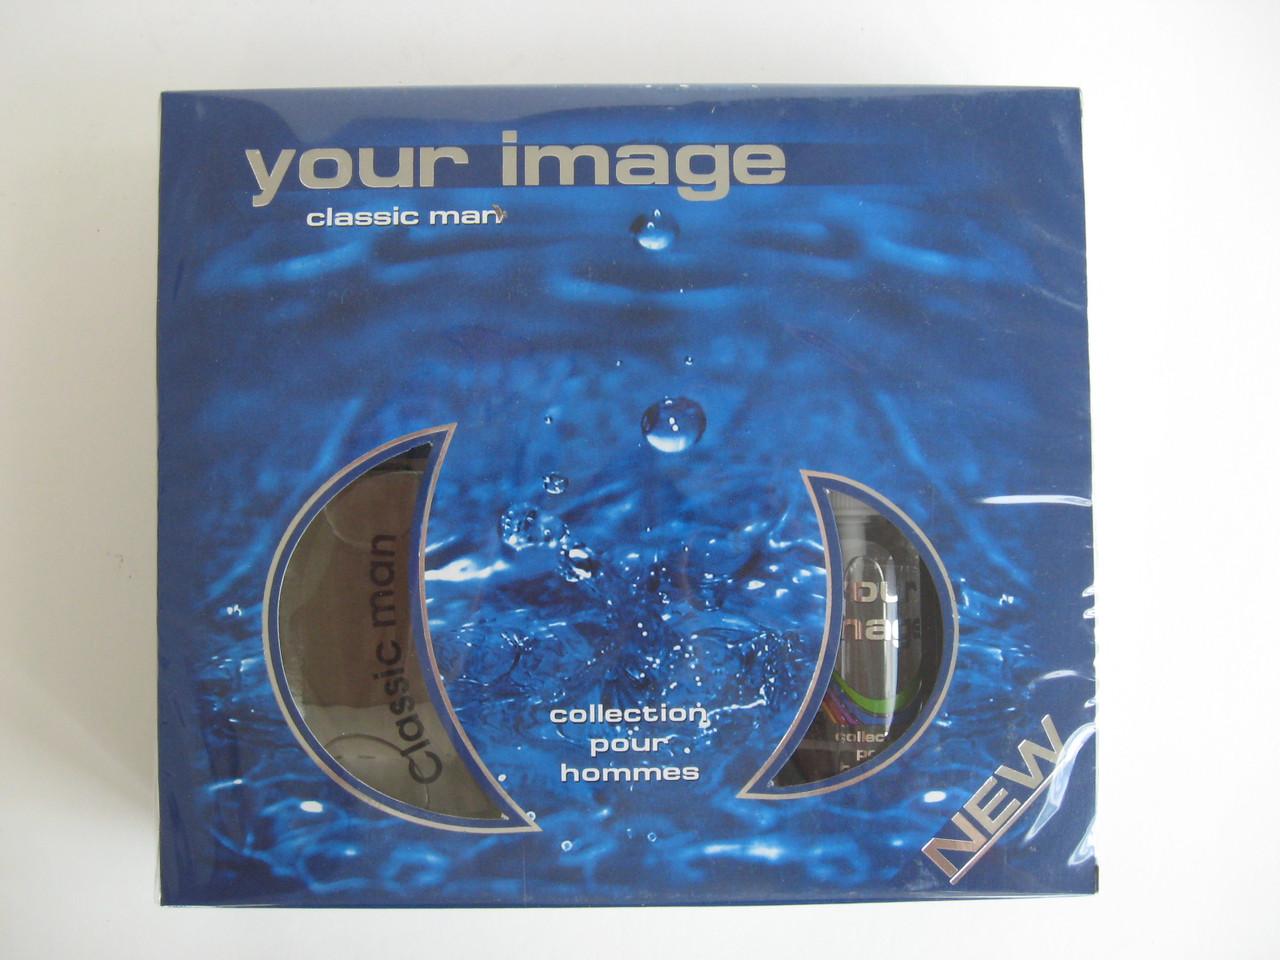 Парфумерний набір - for men - Classic (Your image) туалетна вода 100мл + рідкий антиперспірант